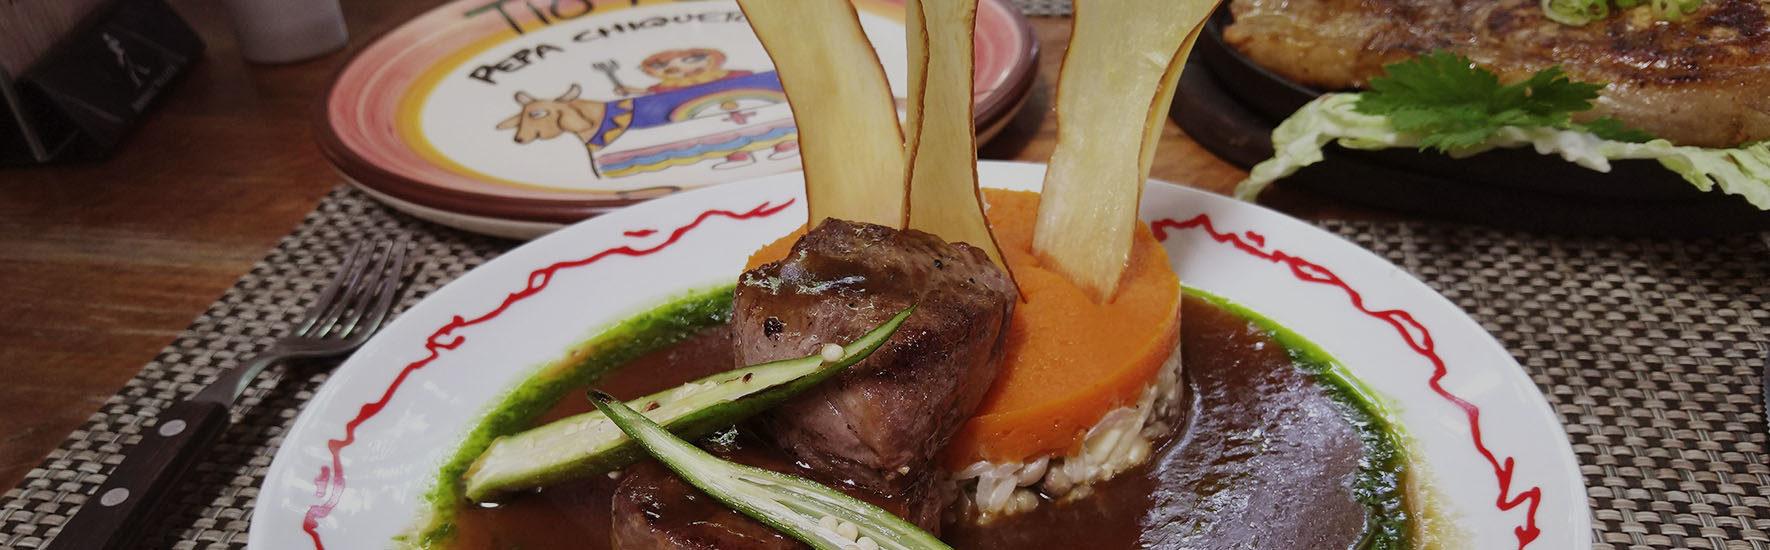 Novo prato da Boa Lembrança do Tio Pepe - Pepa Chiquetosa